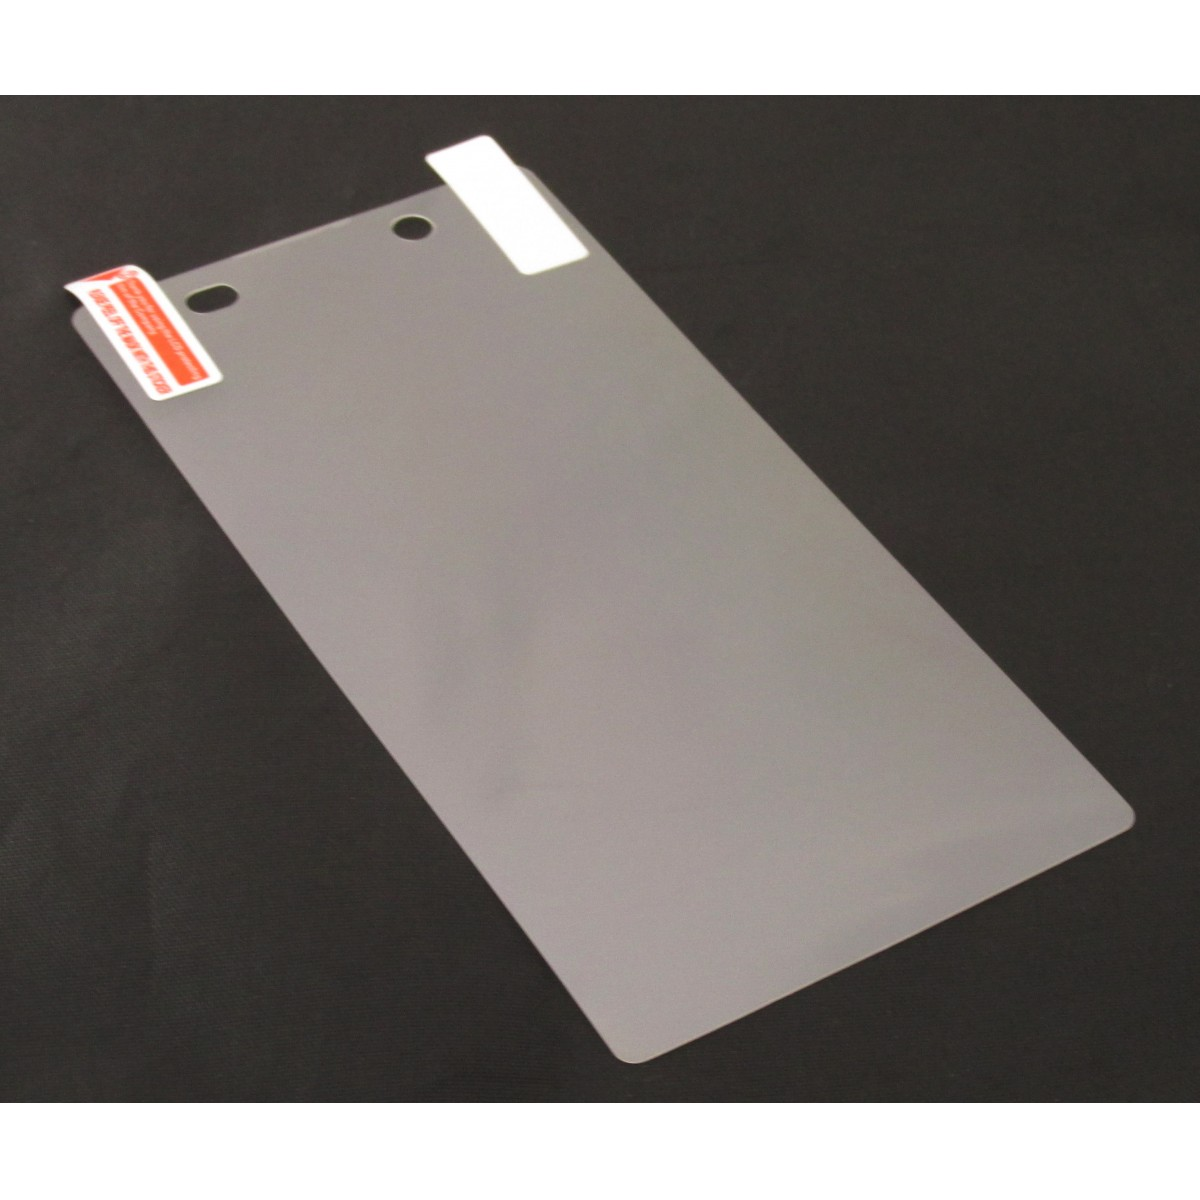 Película protetora para Sony Xperia Z2 D6502 - Fosca